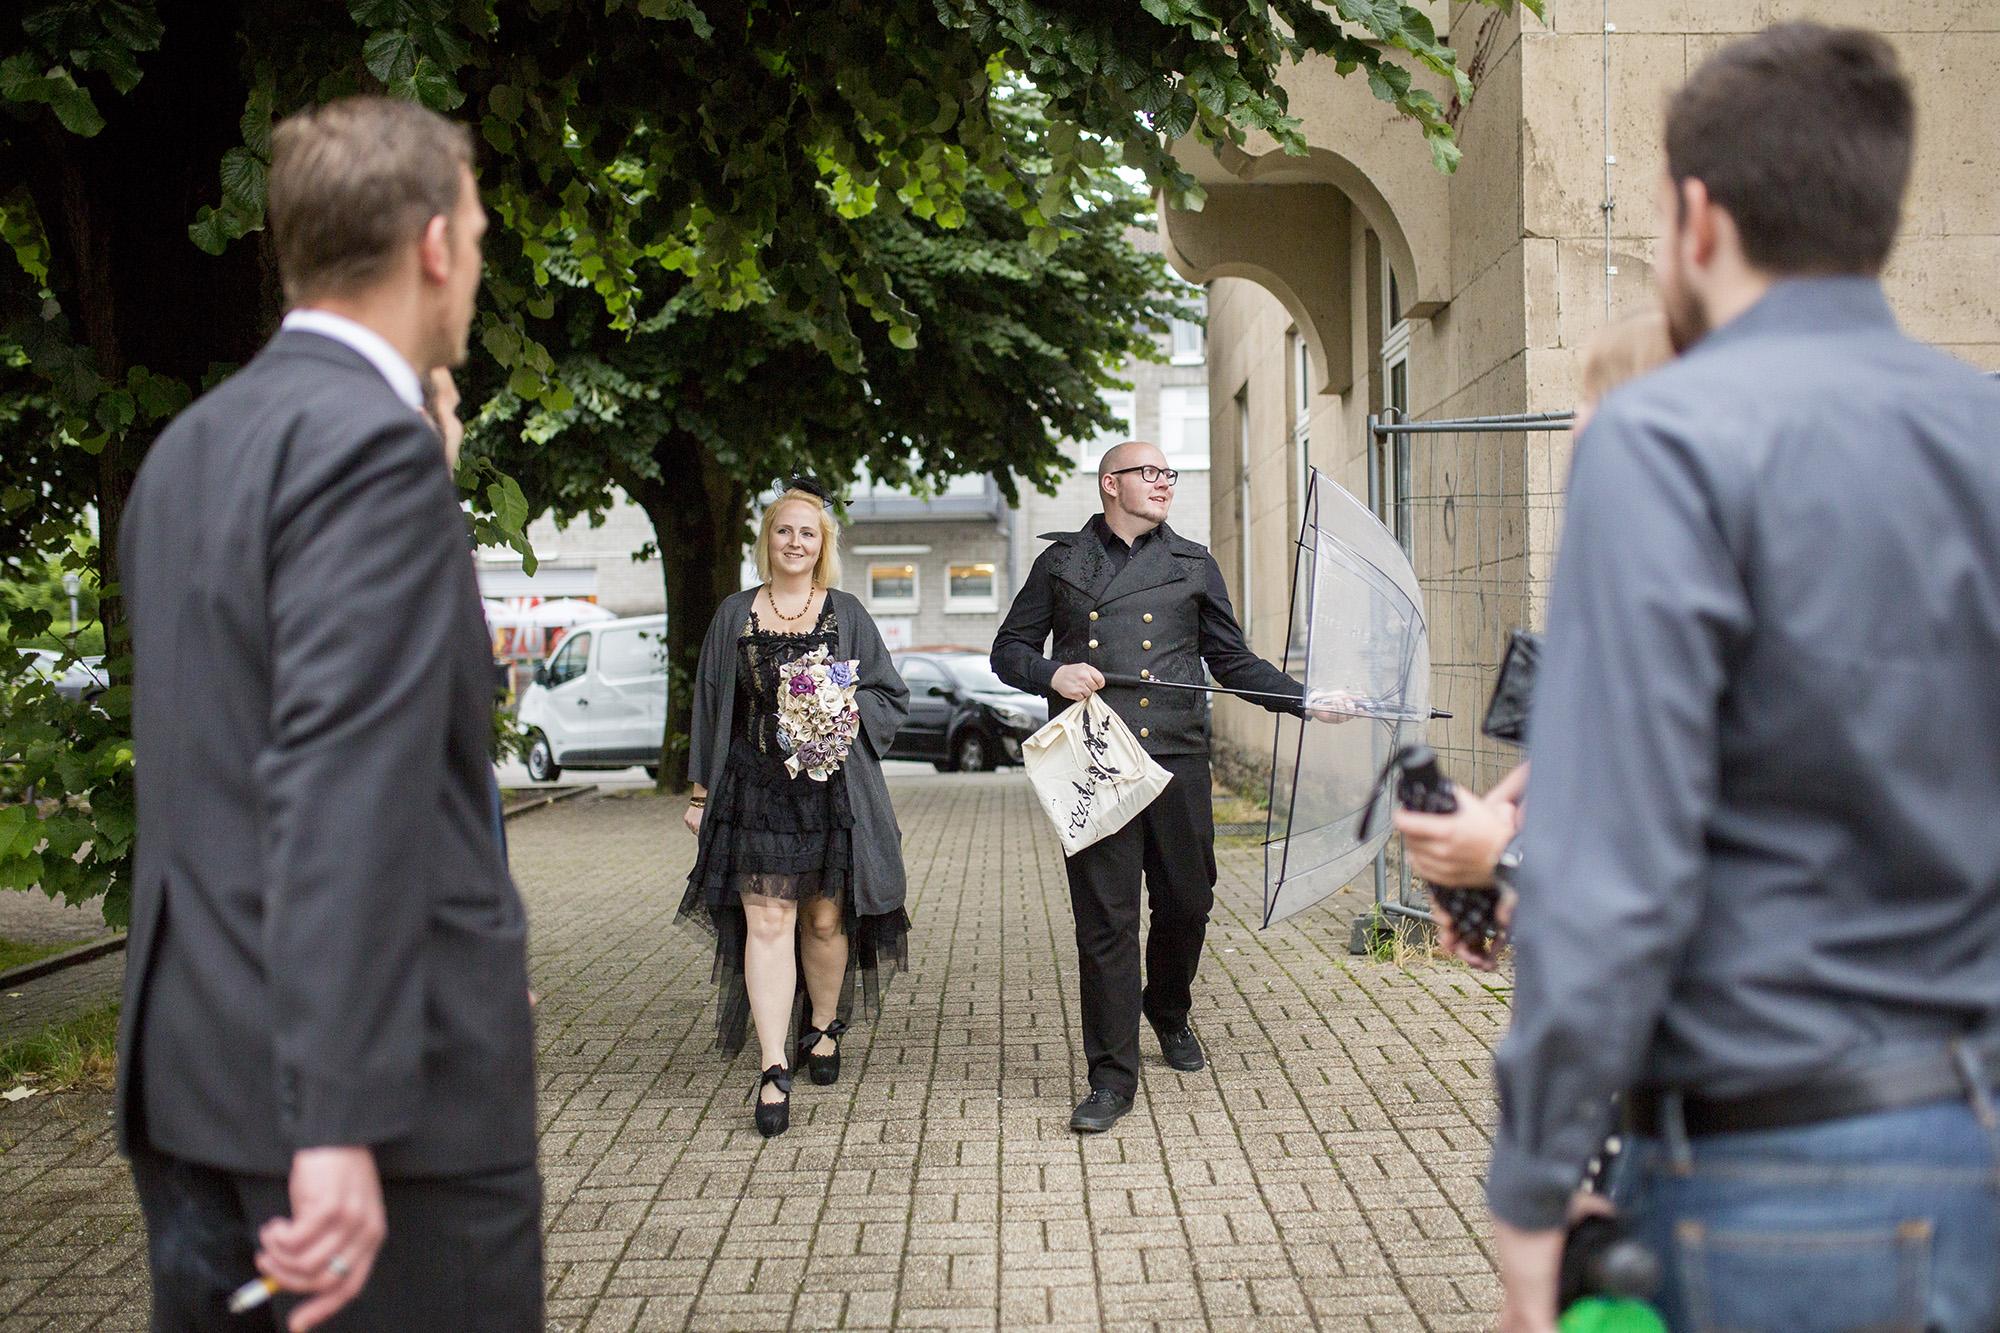 Seriously_Sabrina_Photography_Essen_Germany_RocknRoll_Hochzeit_Wedding_PatrickJenny22.jpg